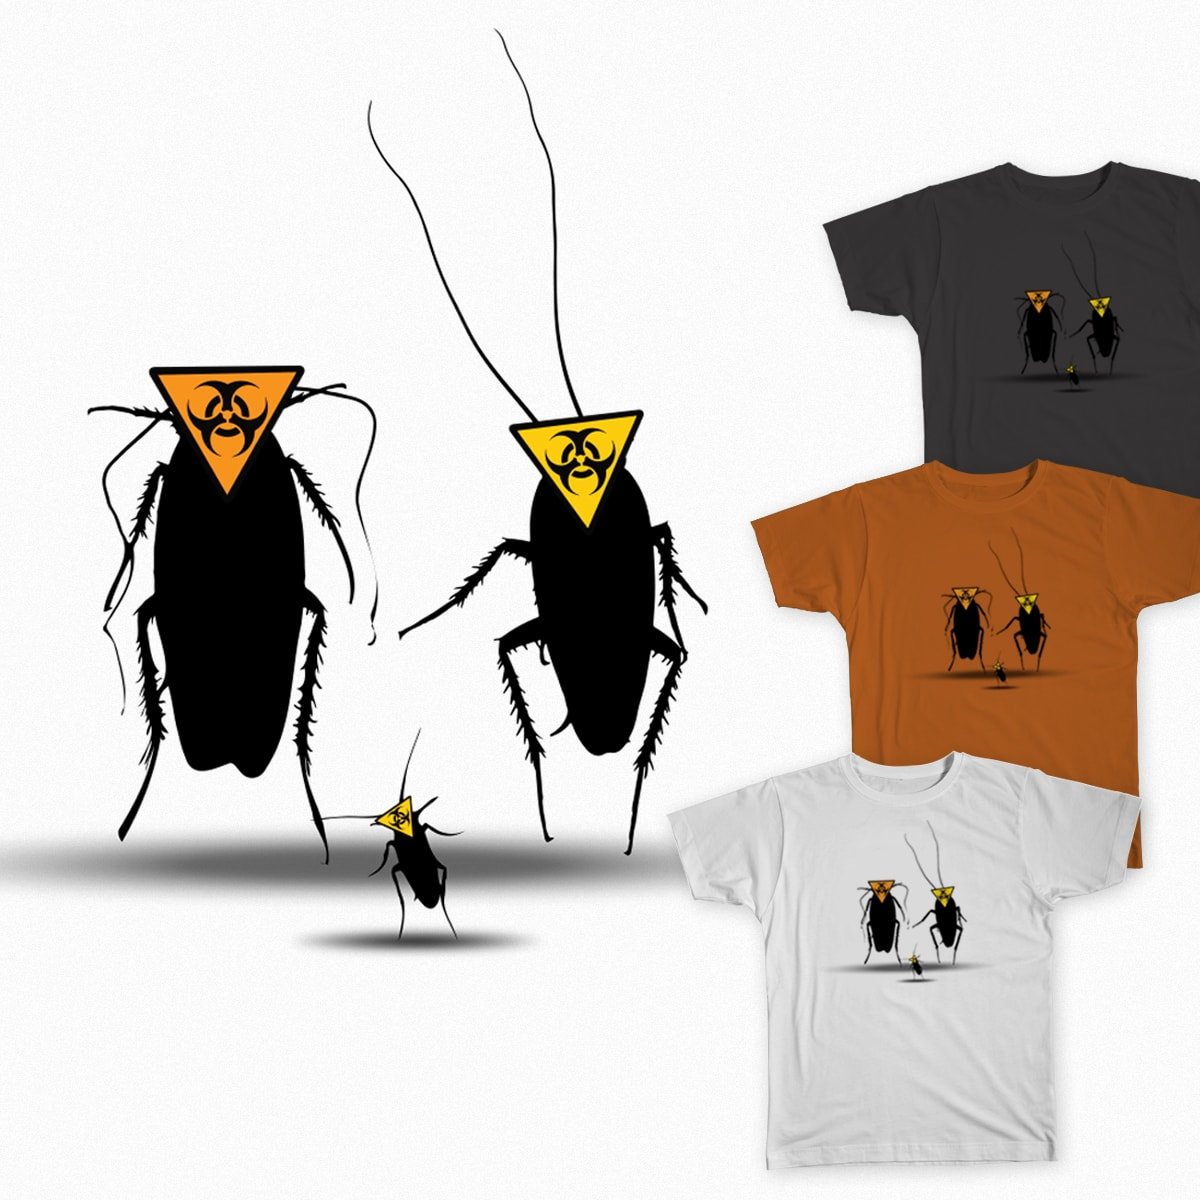 Biohazard bugs by artan.meta.3 on Threadless